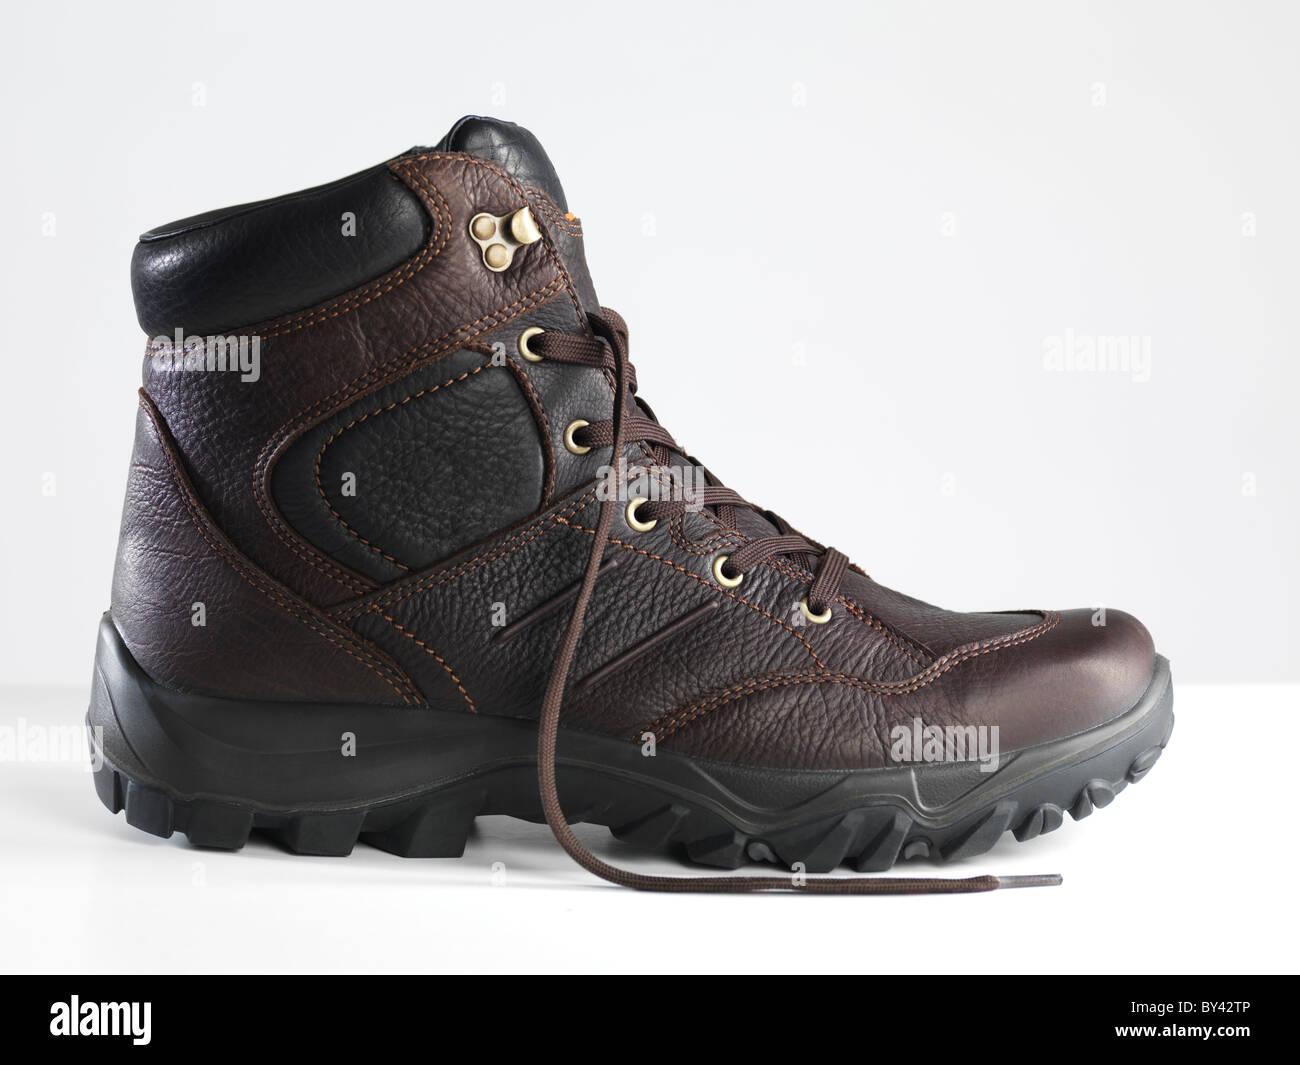 White Leather Boots Stockfotos   White Leather Boots Bilder - Alamy 75ba22a8e9